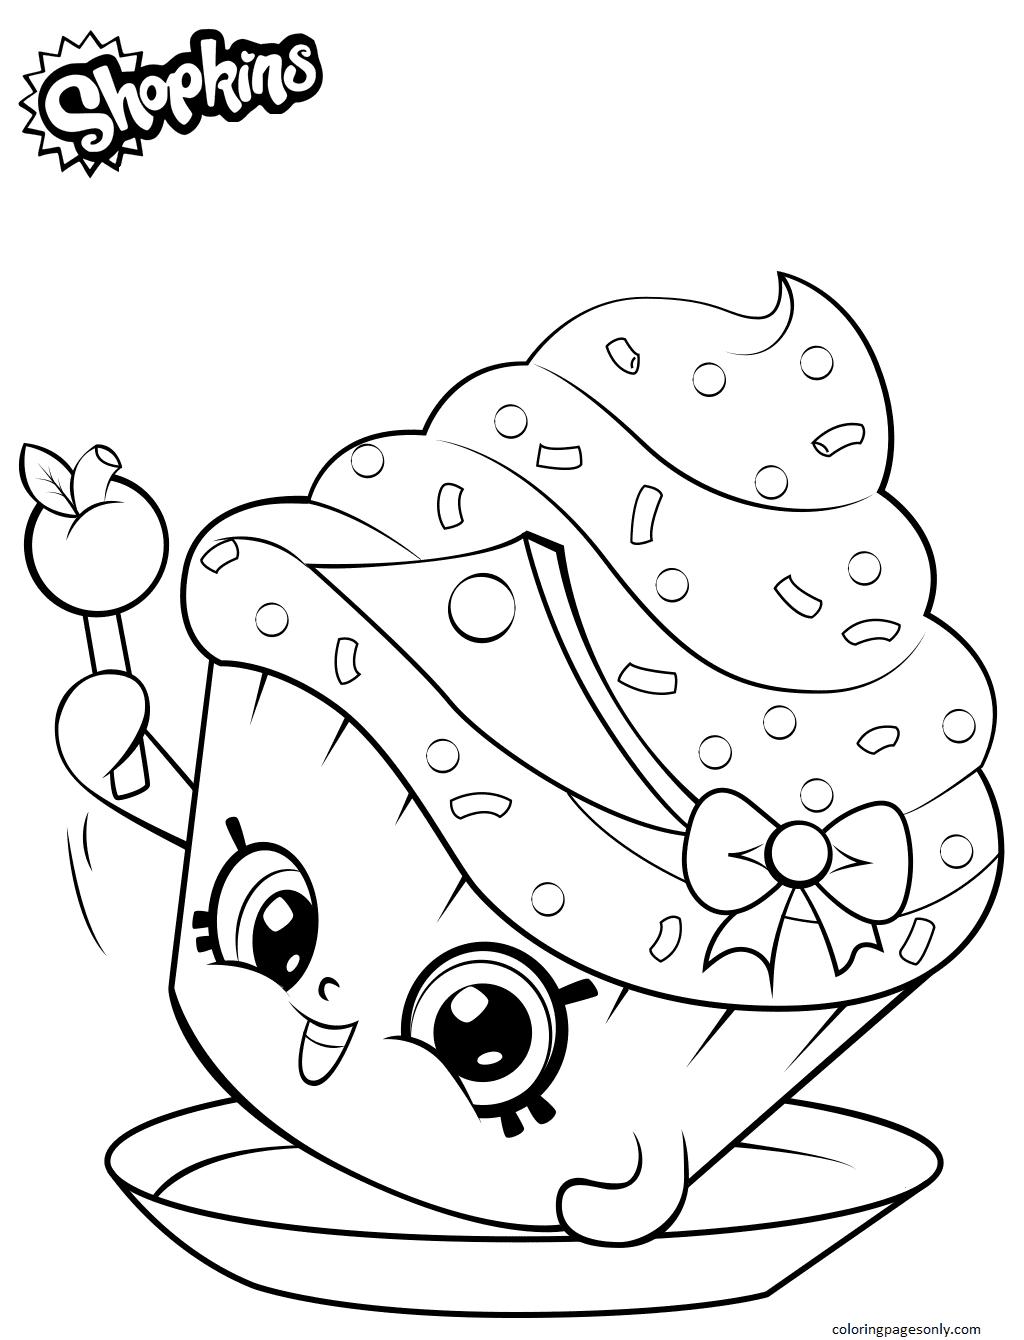 Shopkins Cupcake Princess Coloring Page